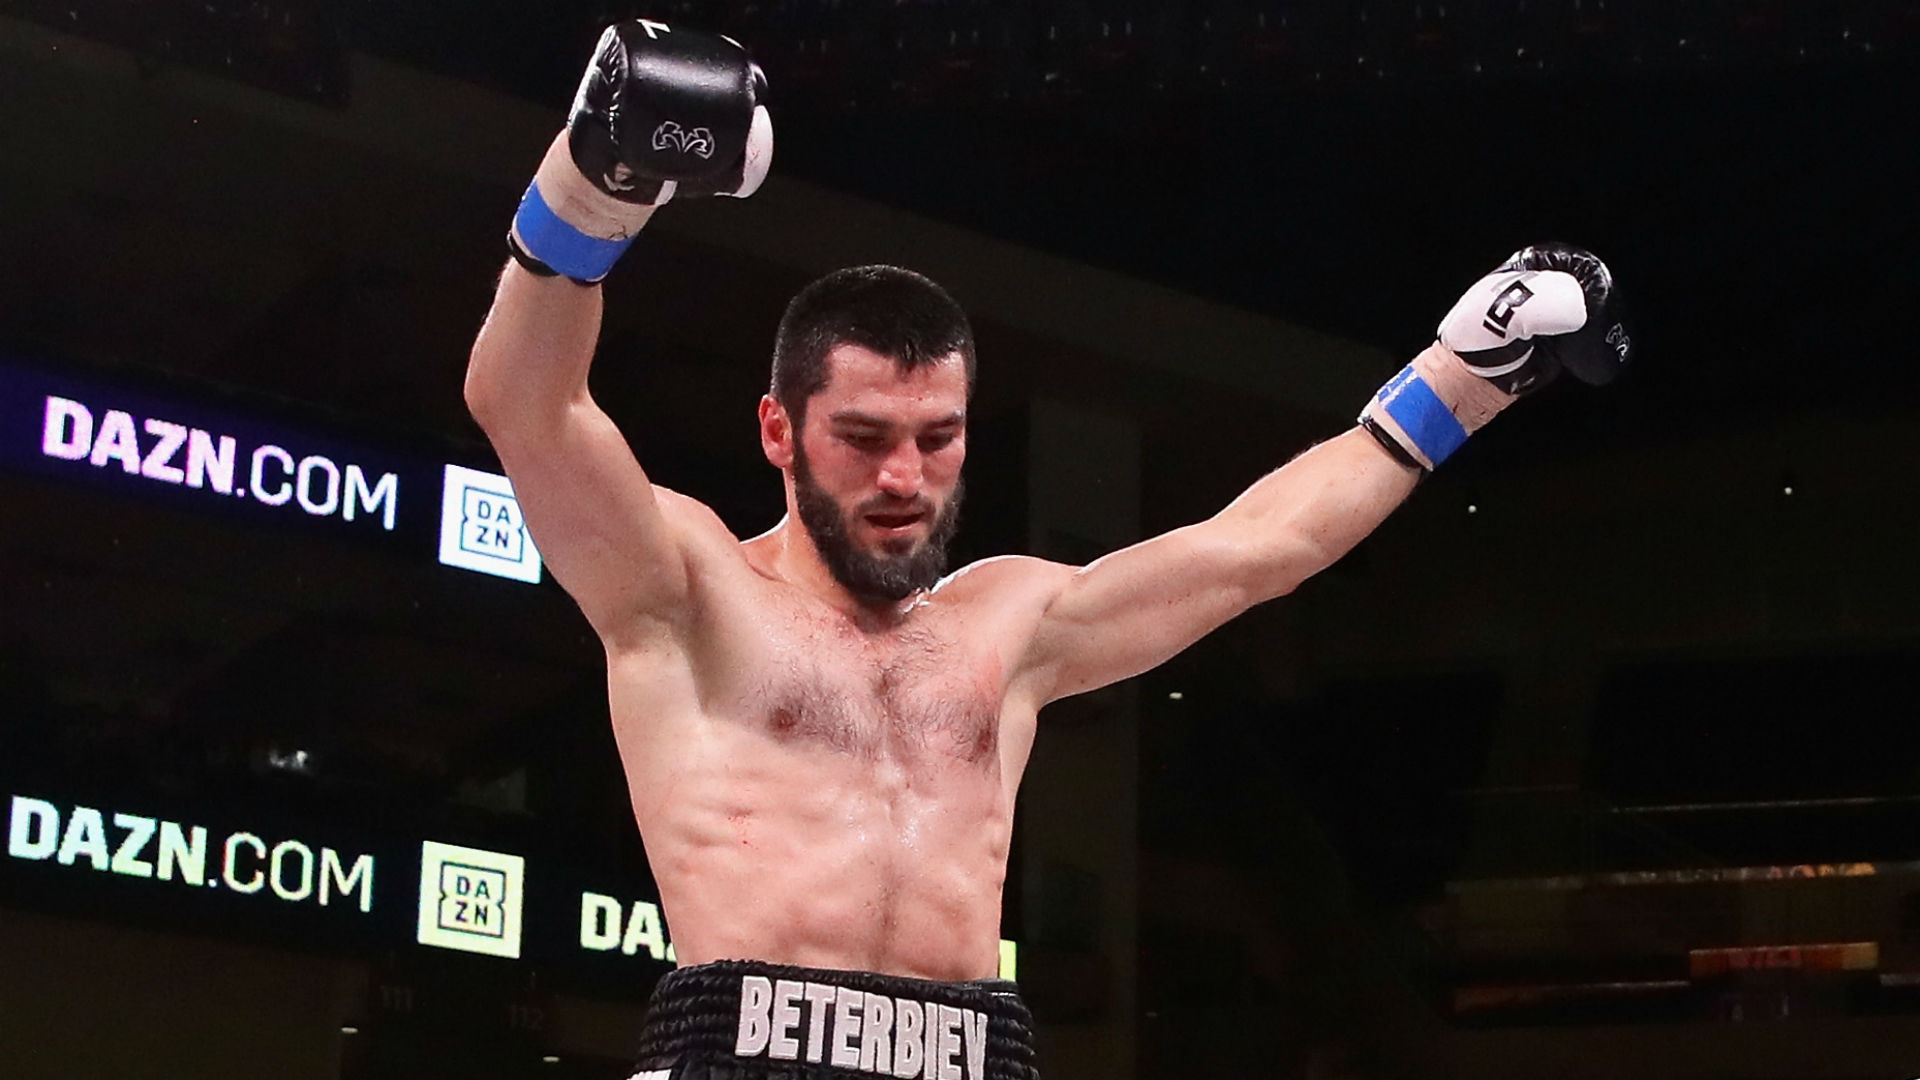 Artur Beterbiev Fight Postponed Due To Covid-19 Positive Test